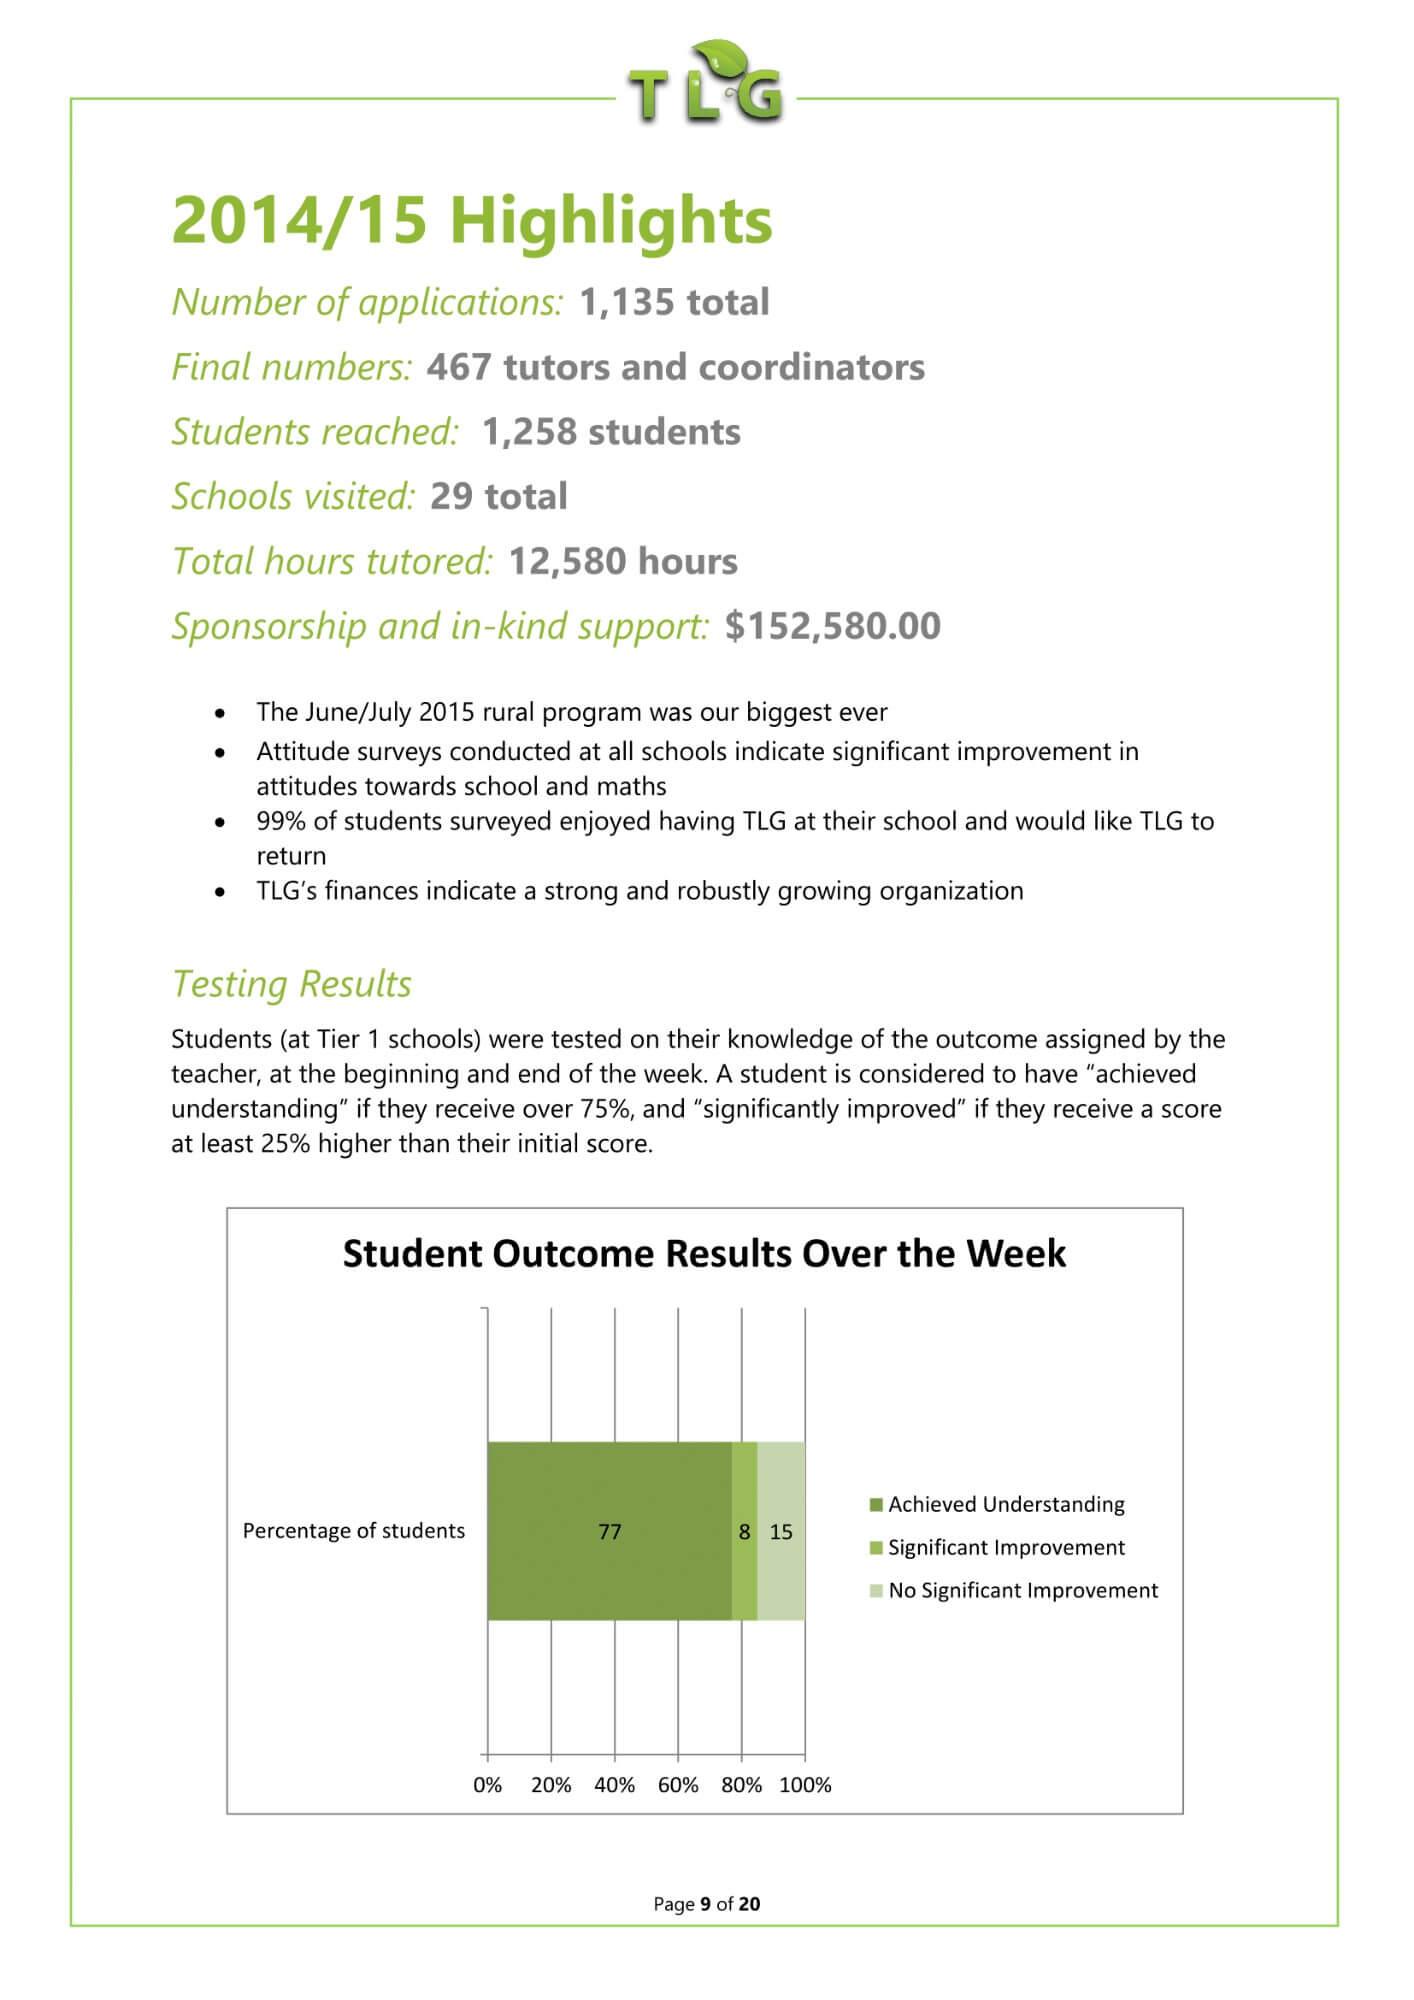 tlg-annual-report-FY14-09.jpg